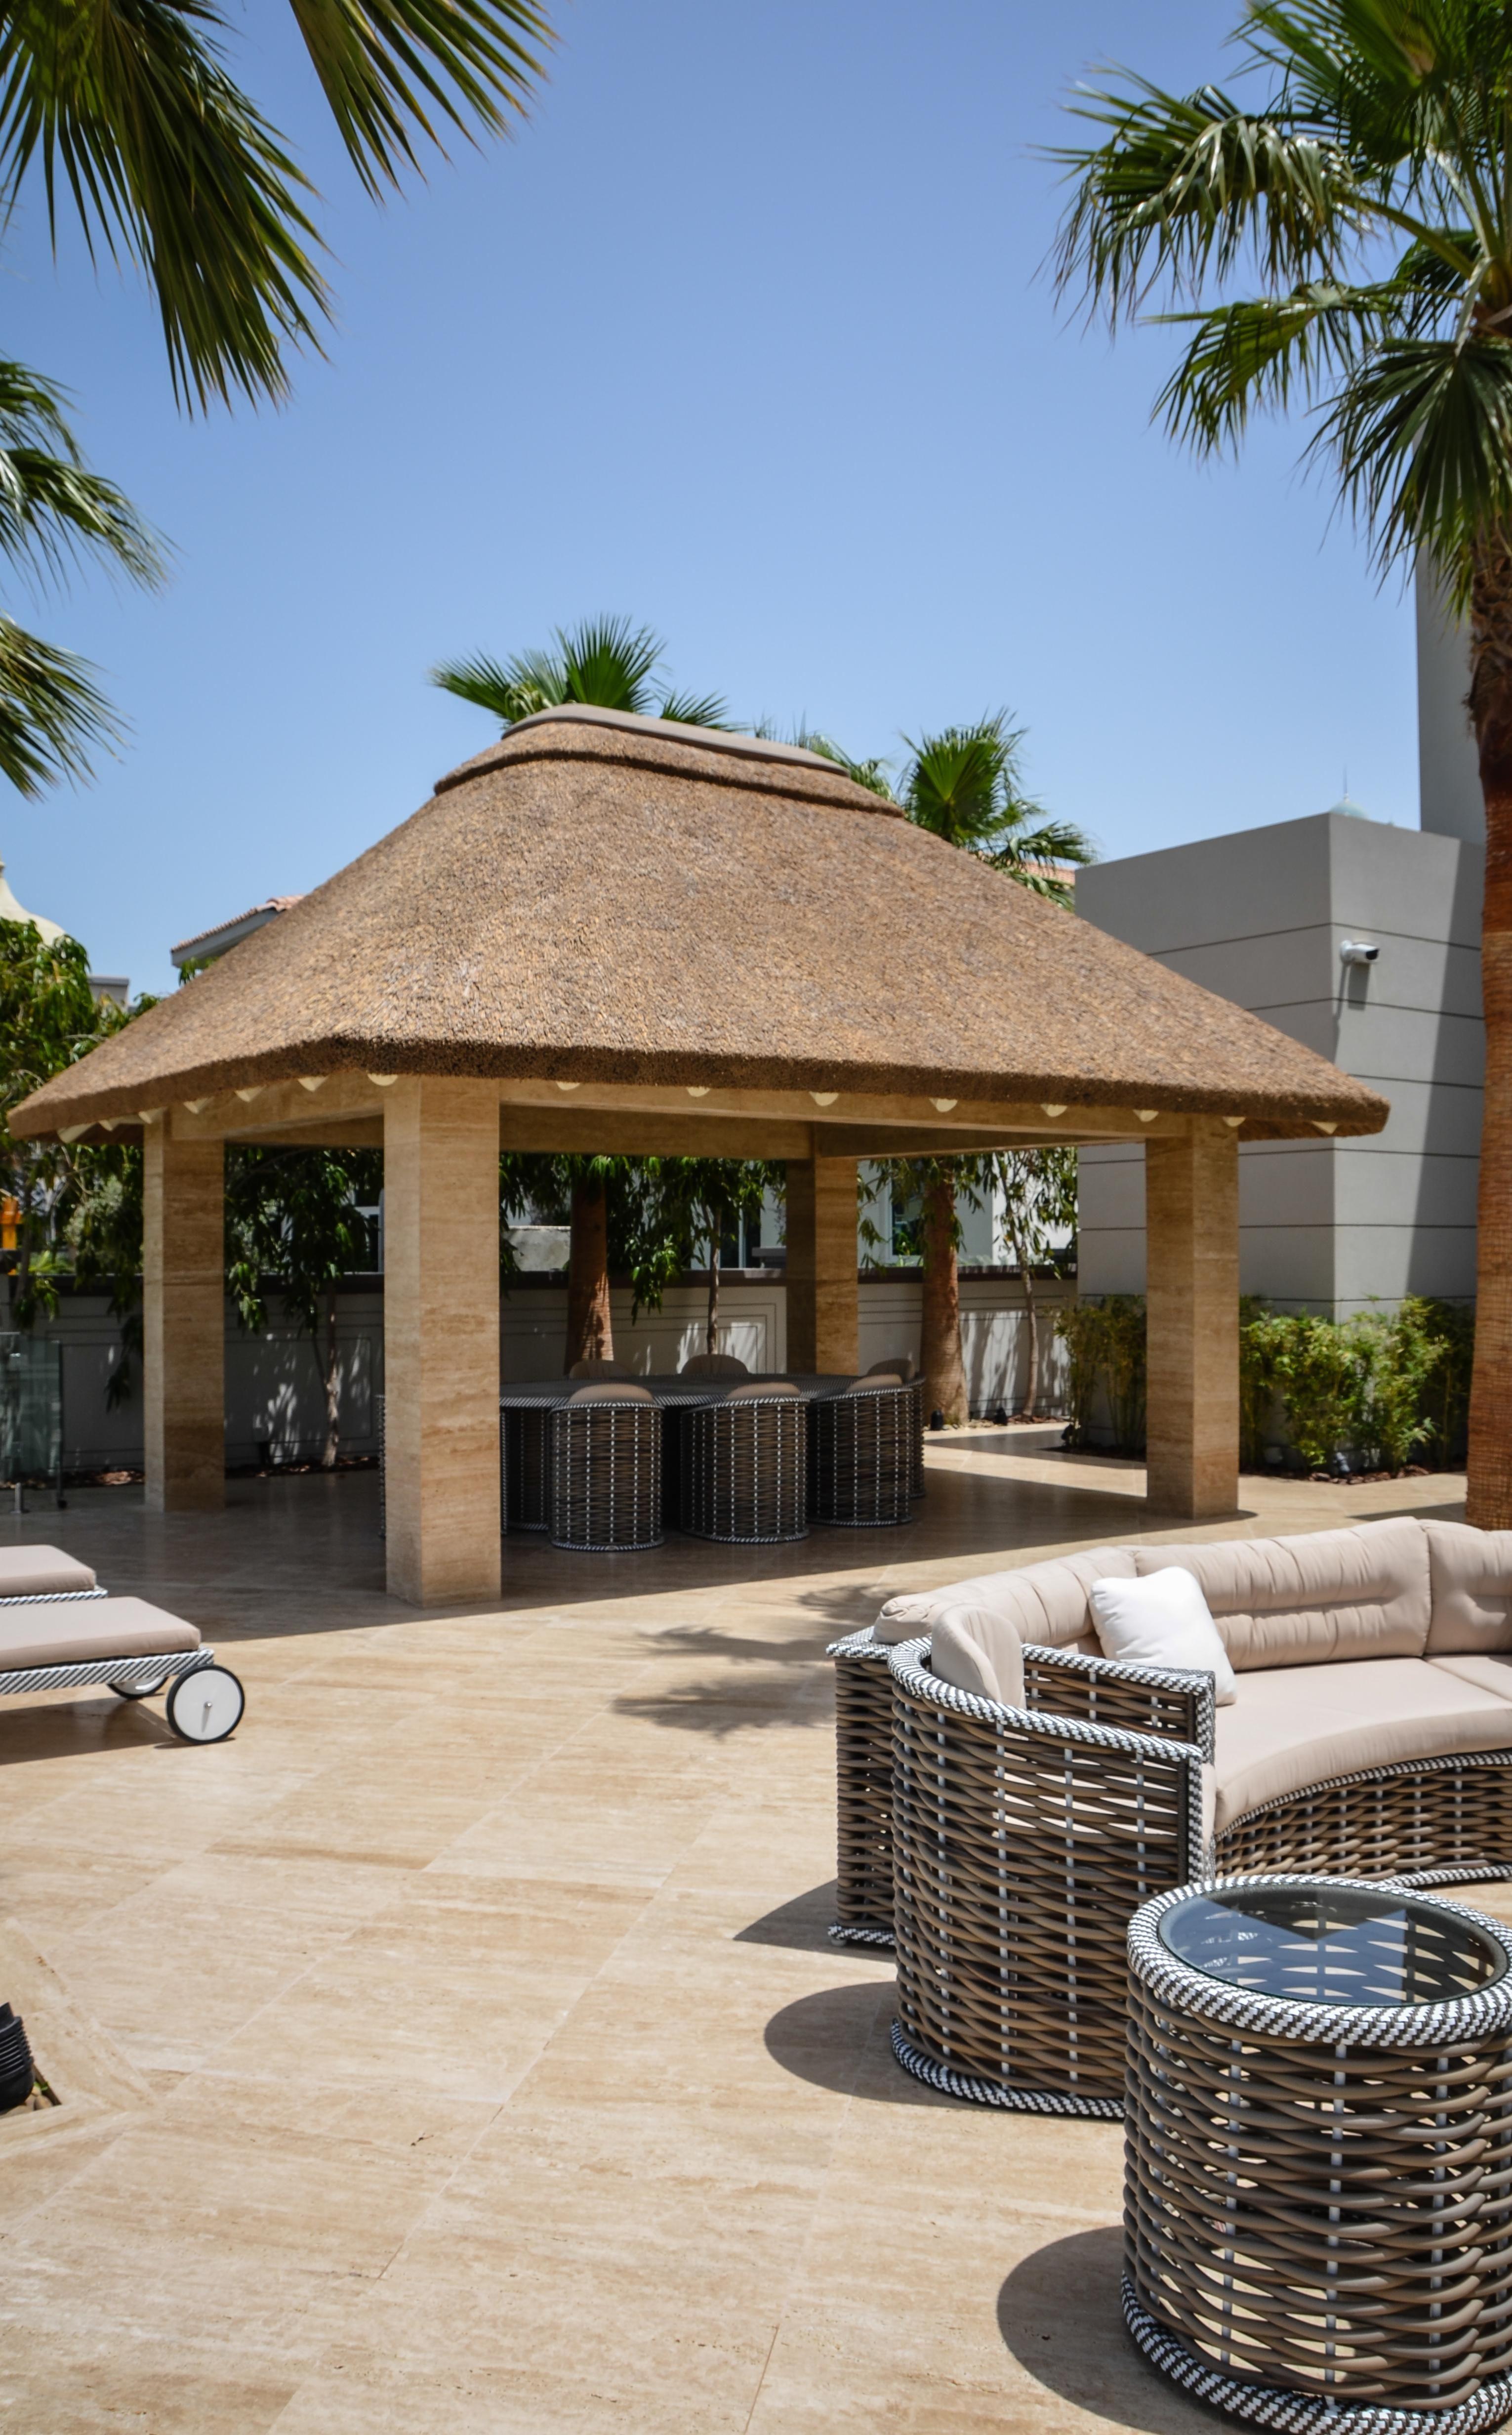 25 Awesome Ideas For Epic Outdoor Entertainment Cape Reed Modern Gazebo Outdoor Living Space Gazebo Backyard modern lapa designs